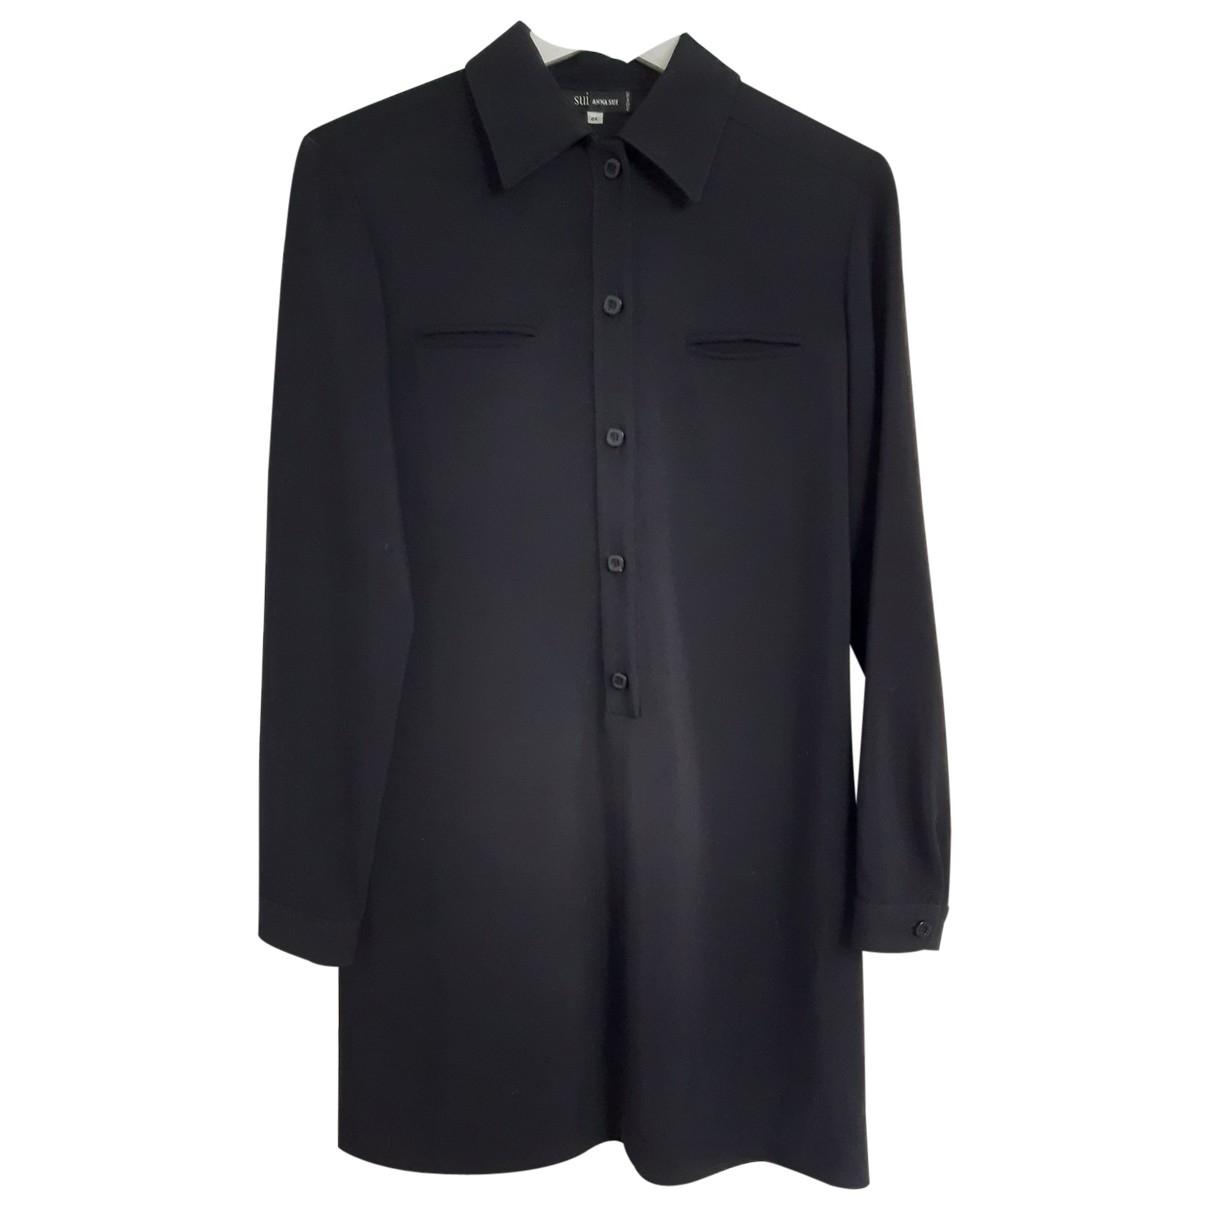 Anna Sui \N Kleid in  Schwarz Synthetik